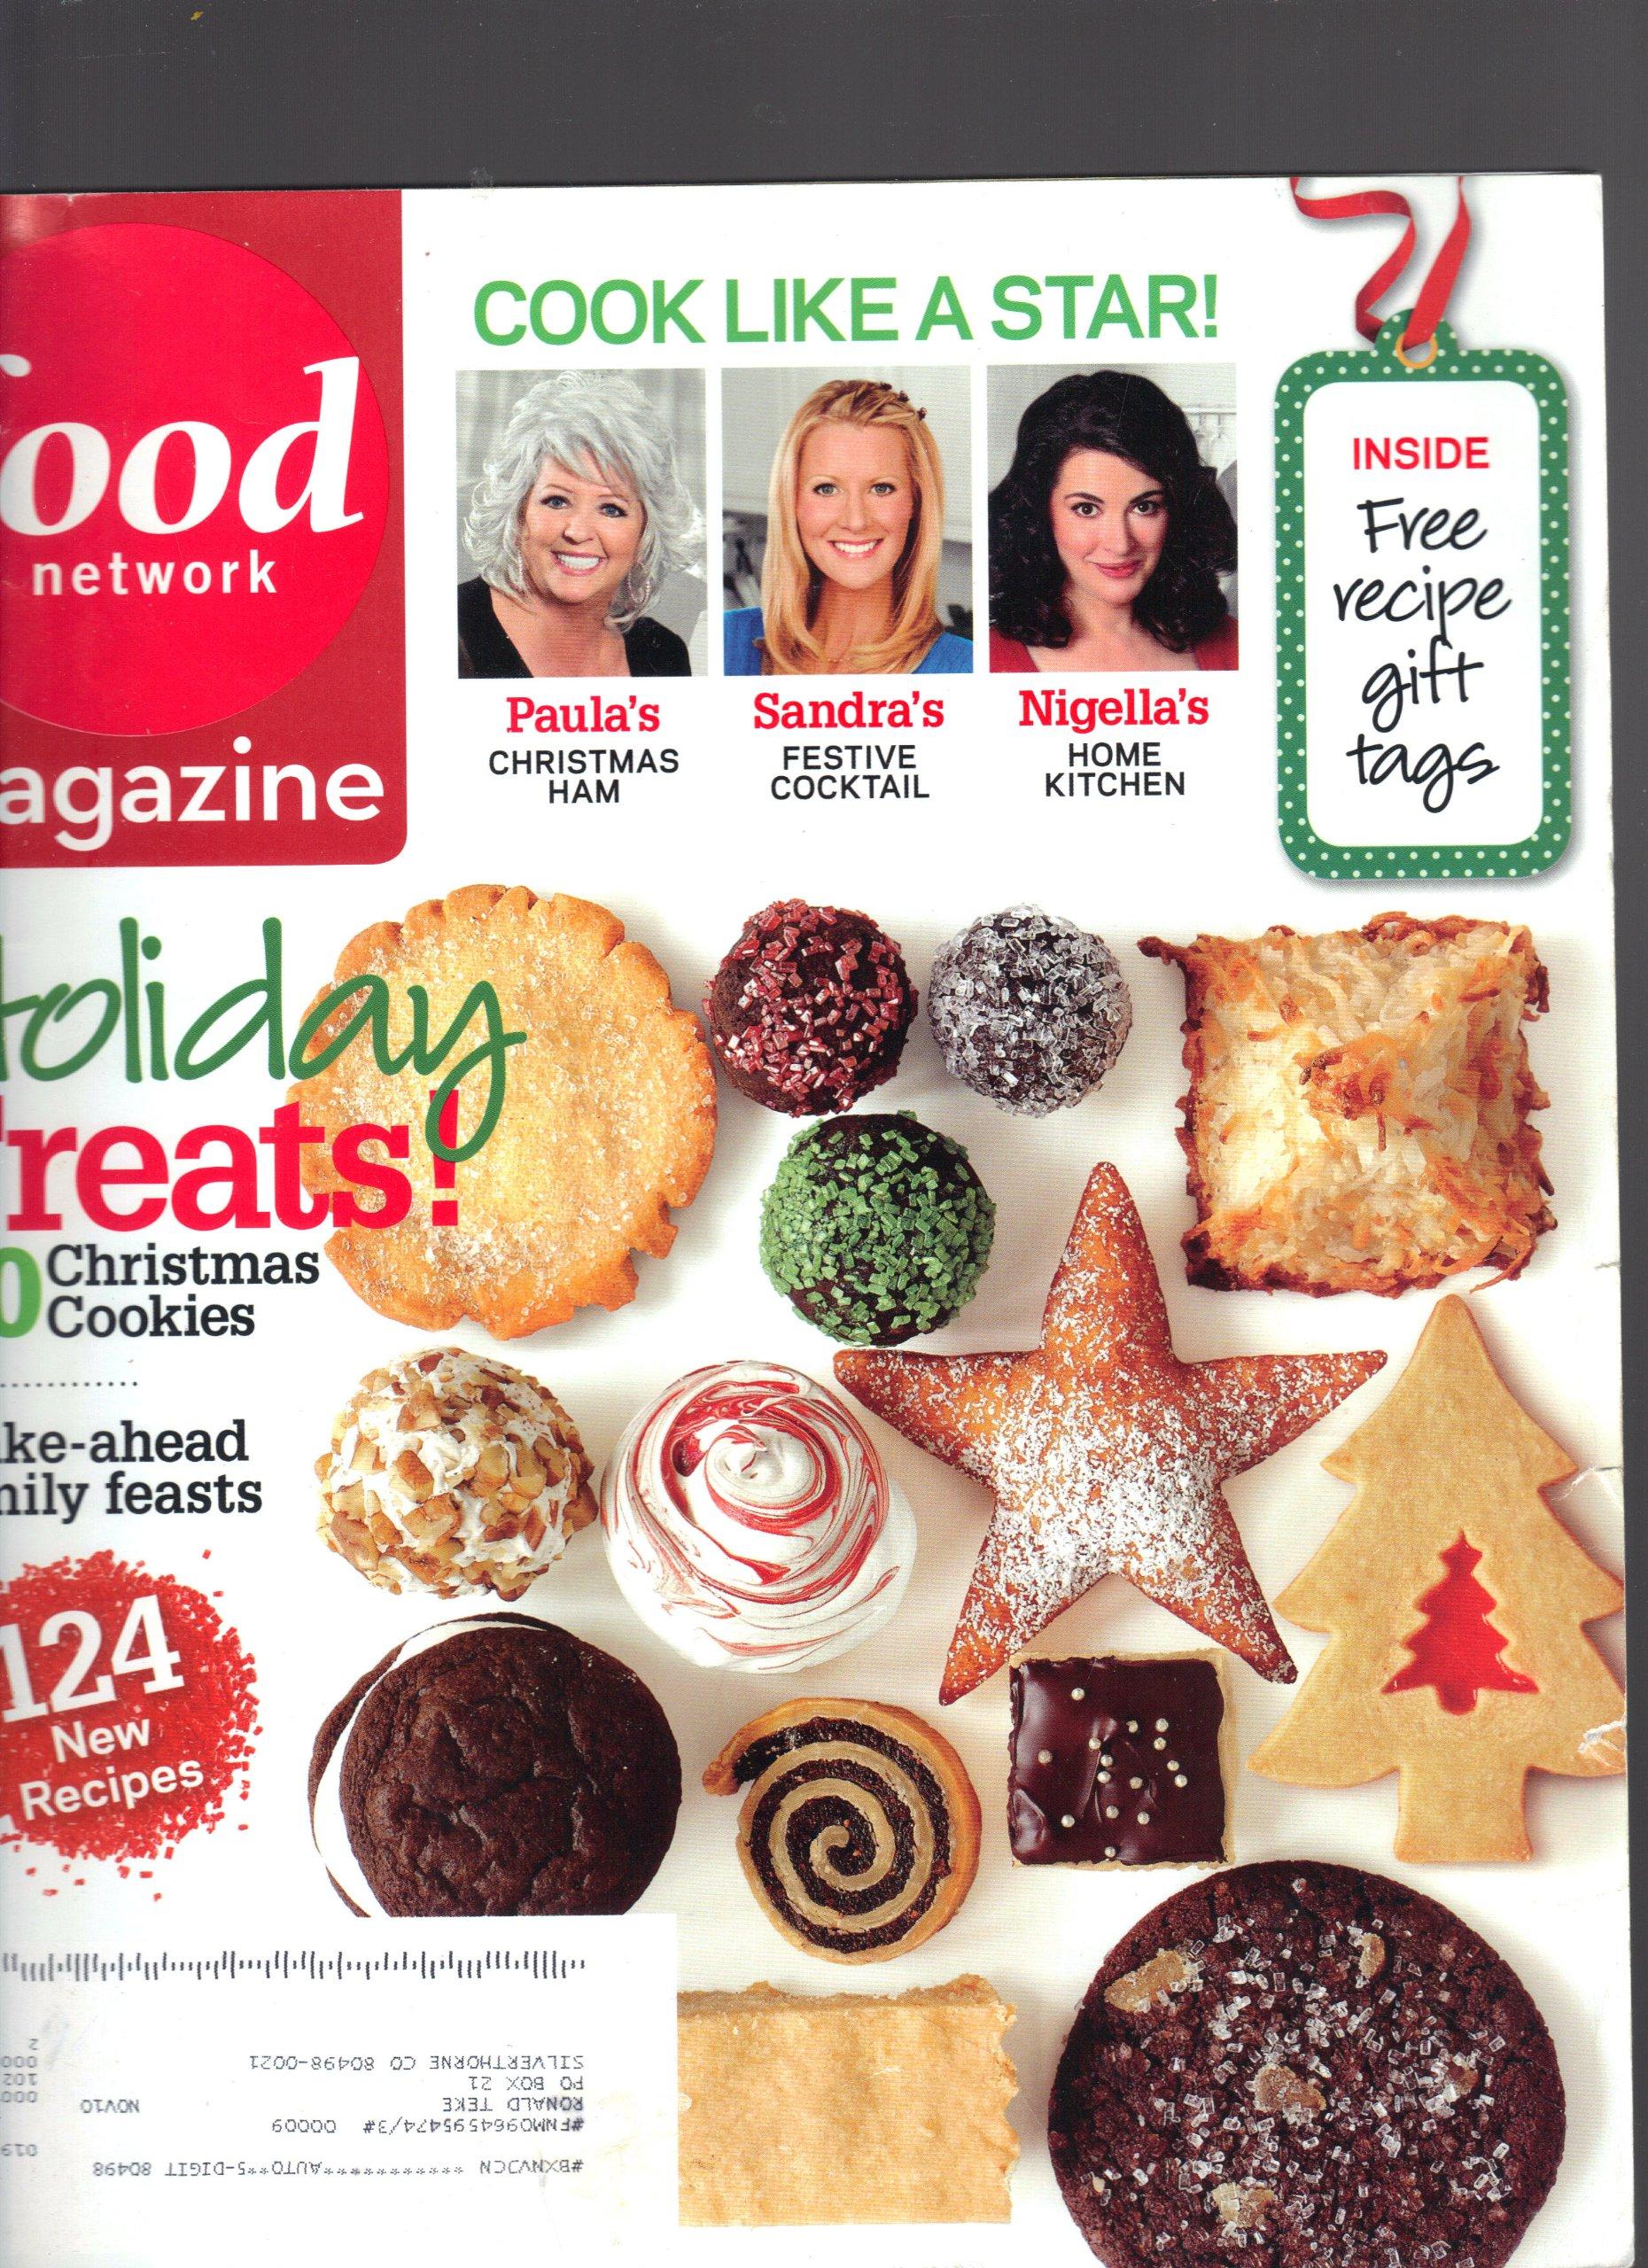 Food Network Magazine December 2009 Cook Like A Star Make Ahead